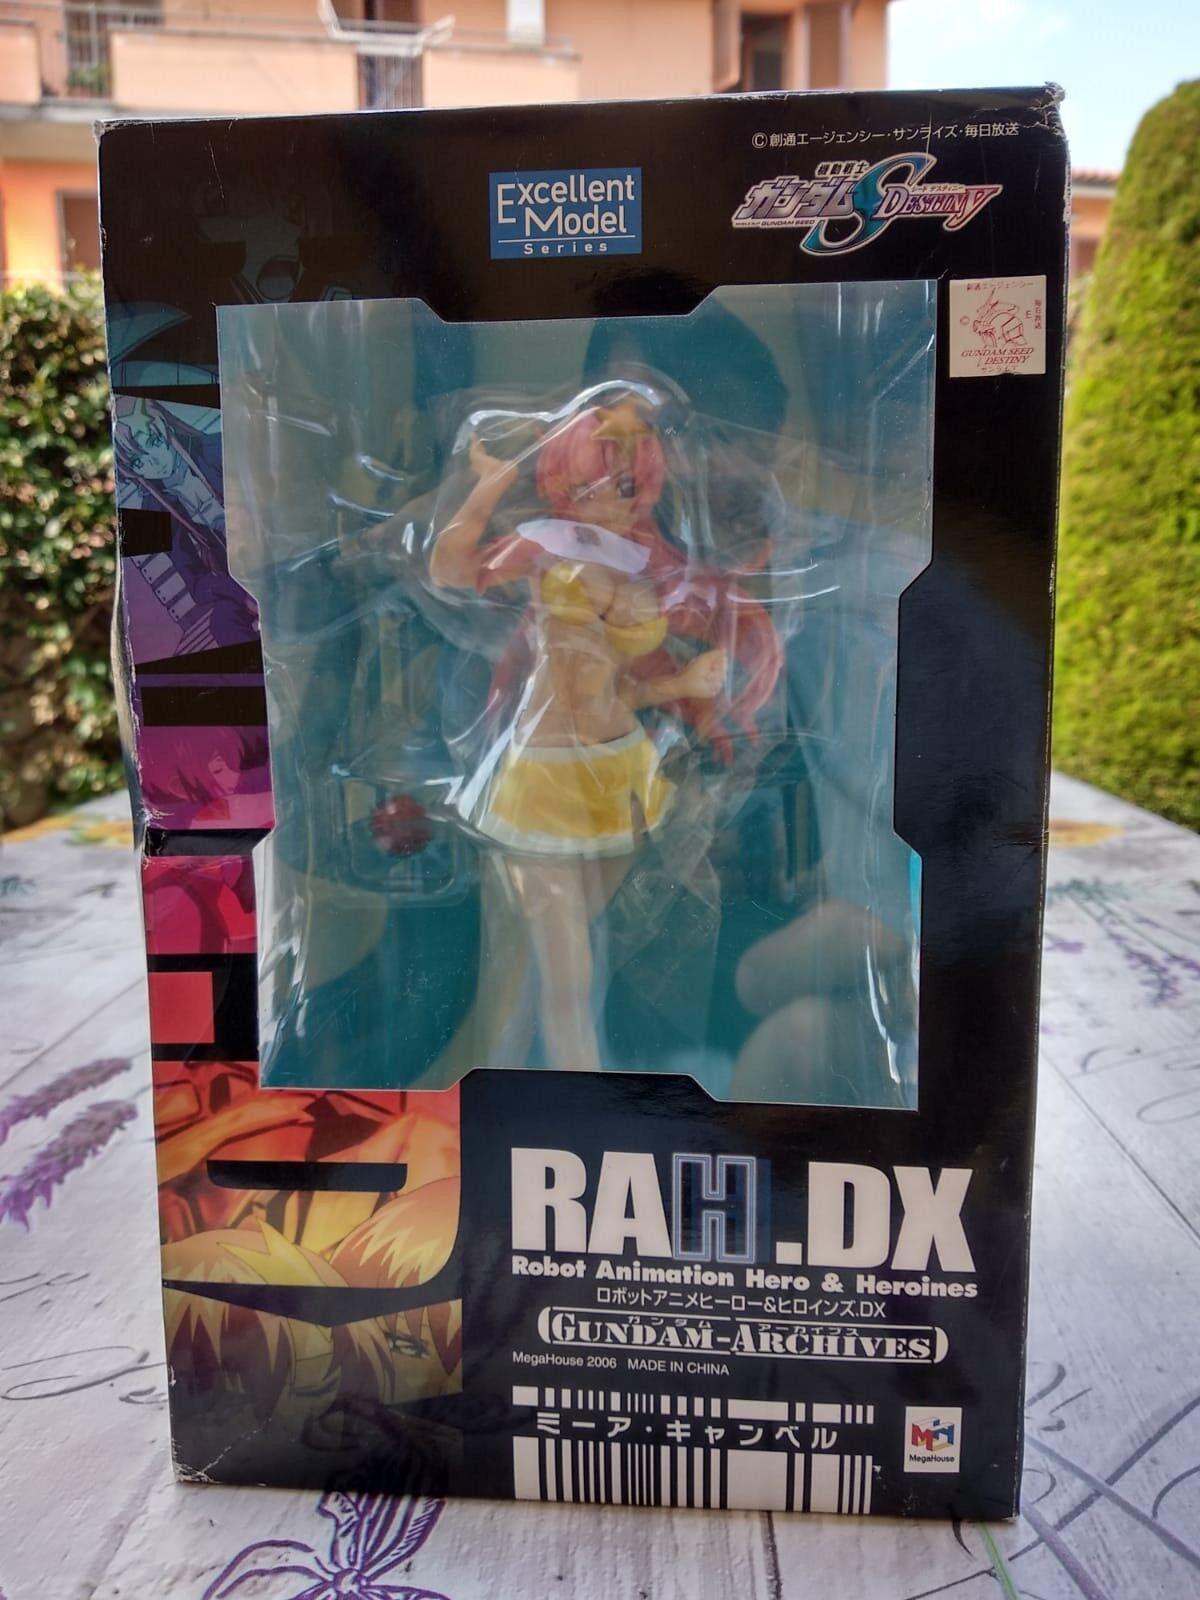 GUNDAM - SEED Destiny -   Pvc Figure RAH DX MegaHouse in BOX (opened) NEW